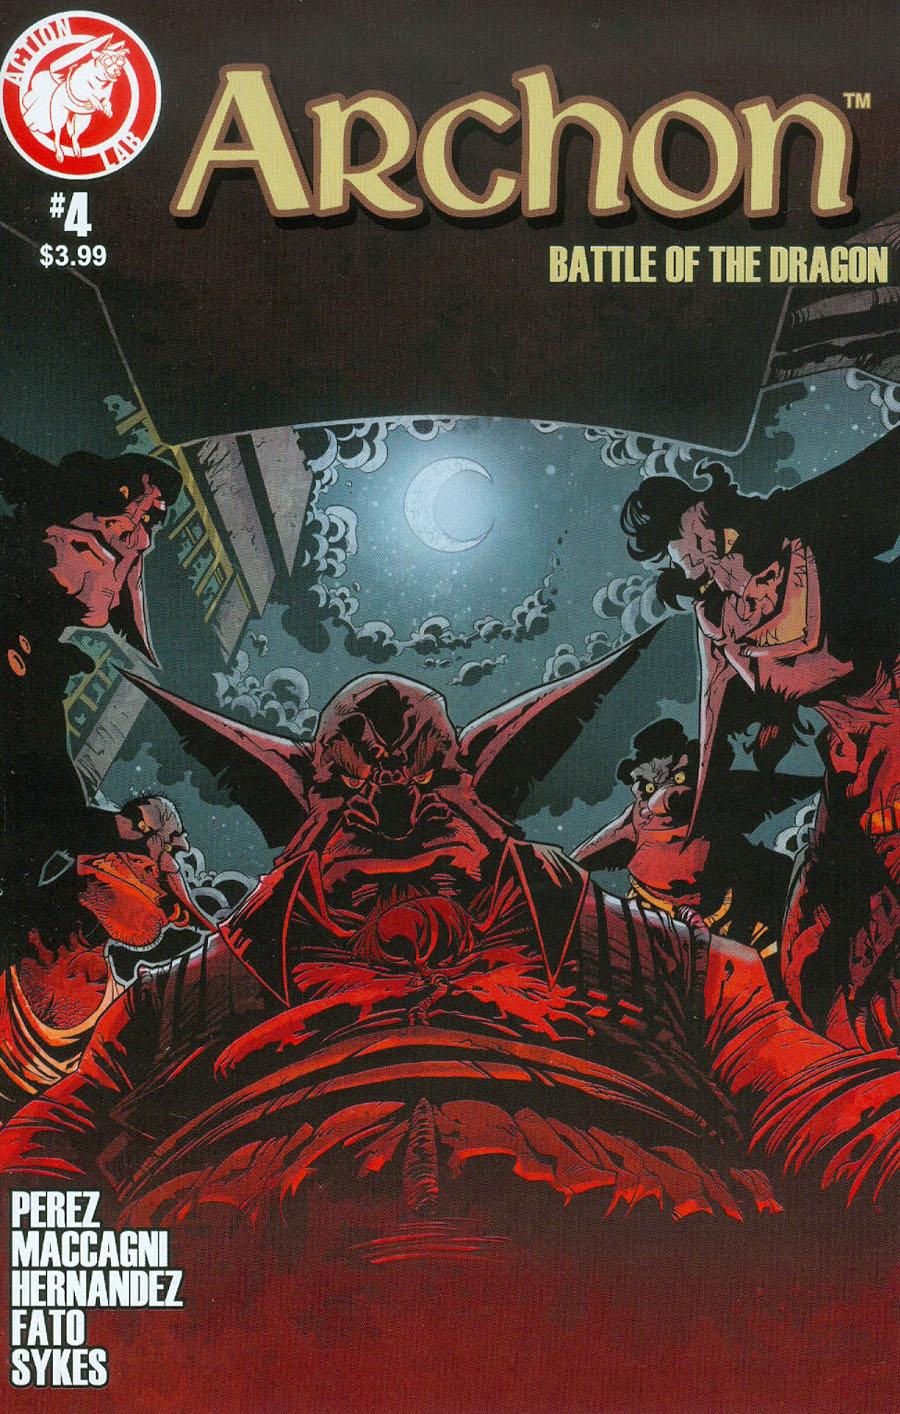 Archon Battle Of The Dragon #4